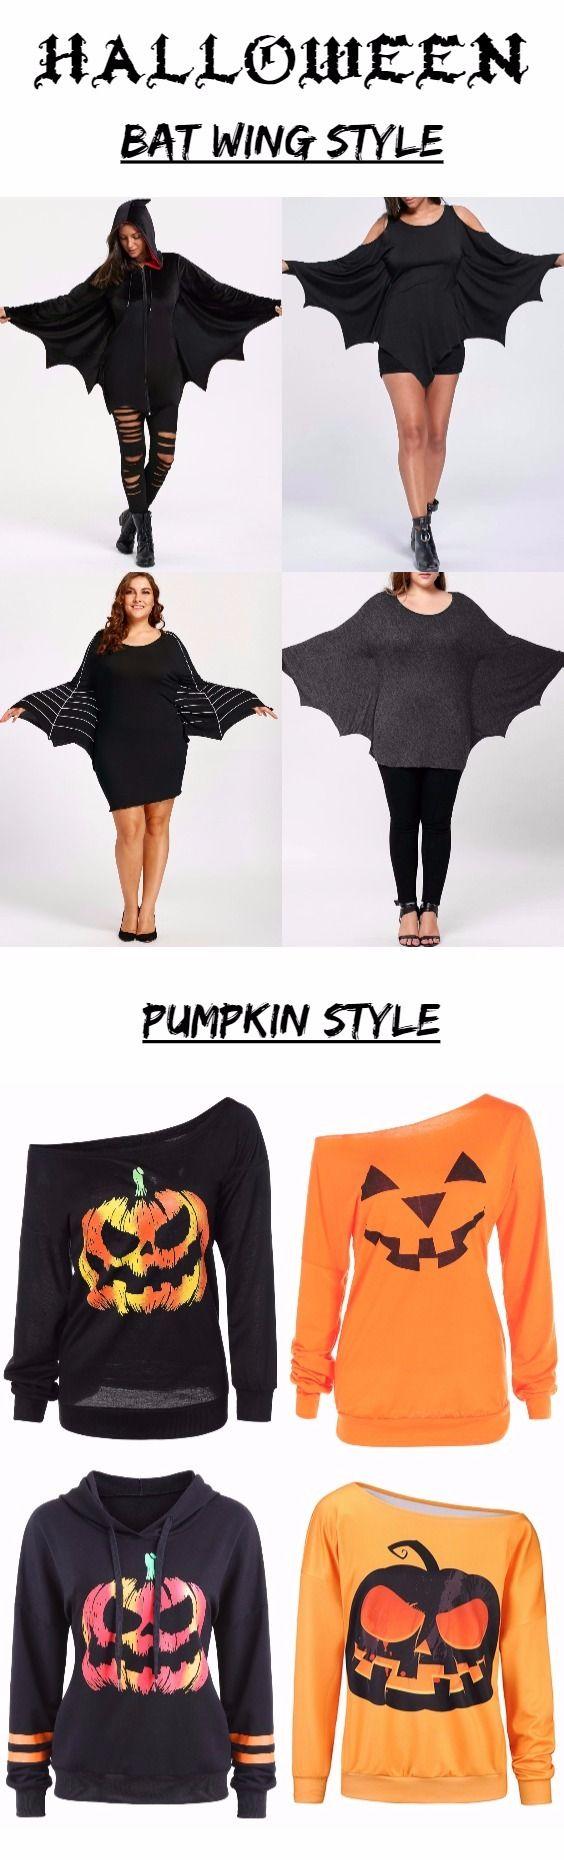 Halloween women outfits - bat wing tops & pumpkin sweatshirts